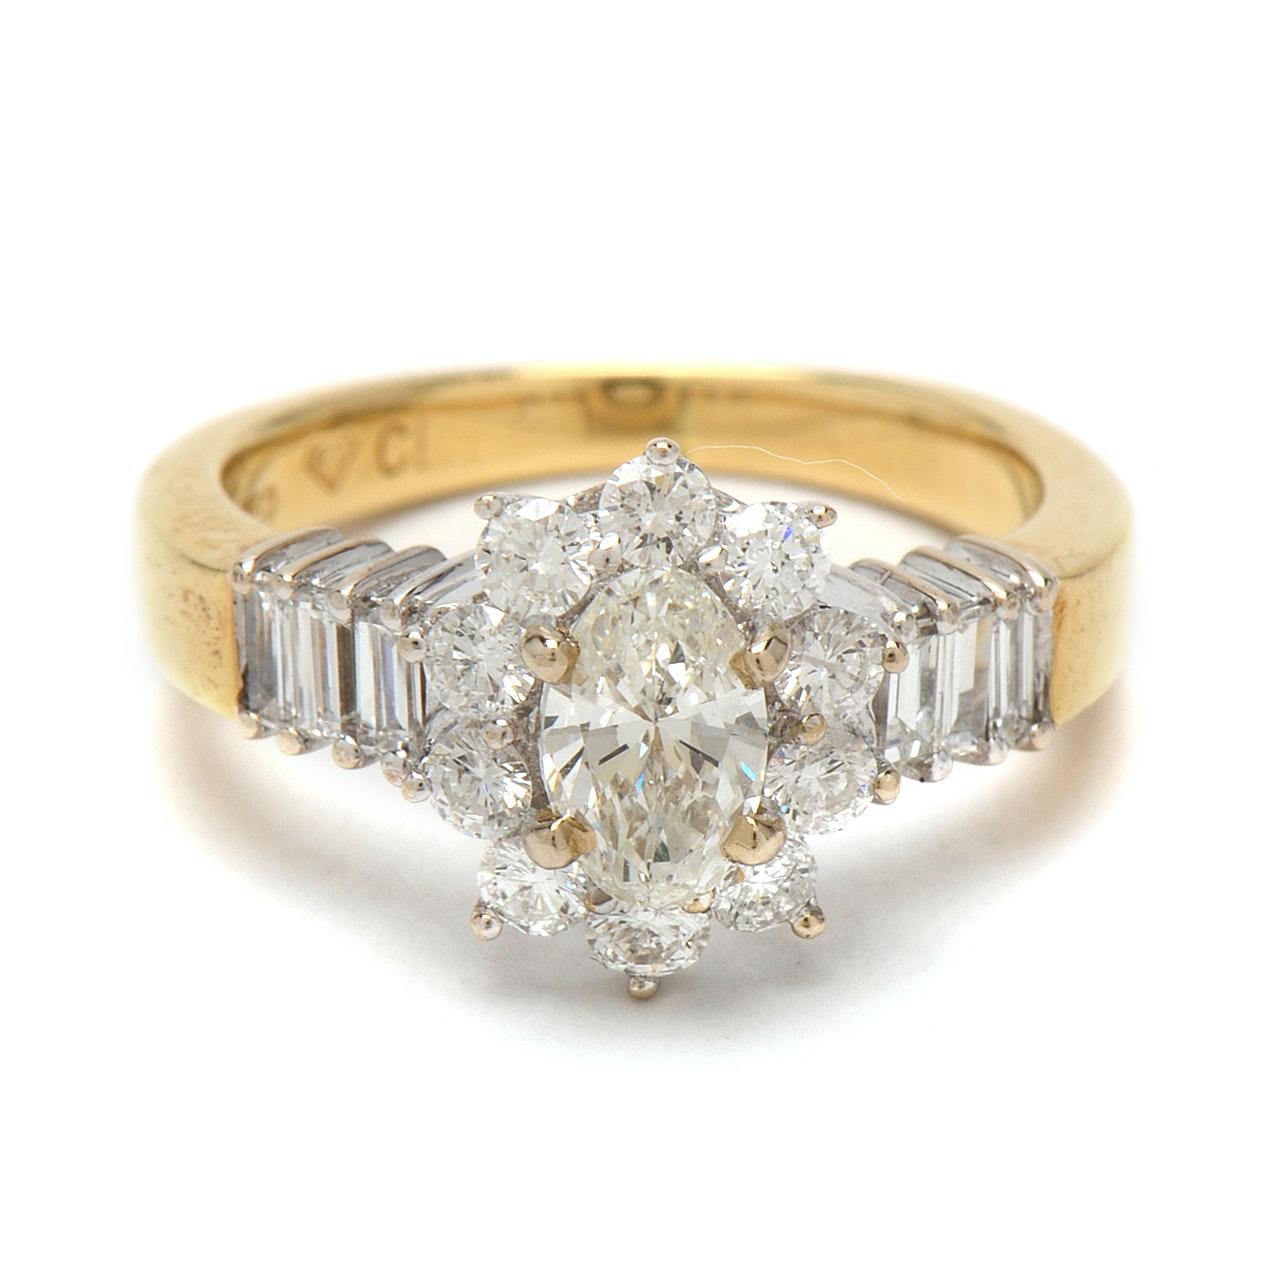 18K Yellow Gold 1.25CTW Diamond Ring